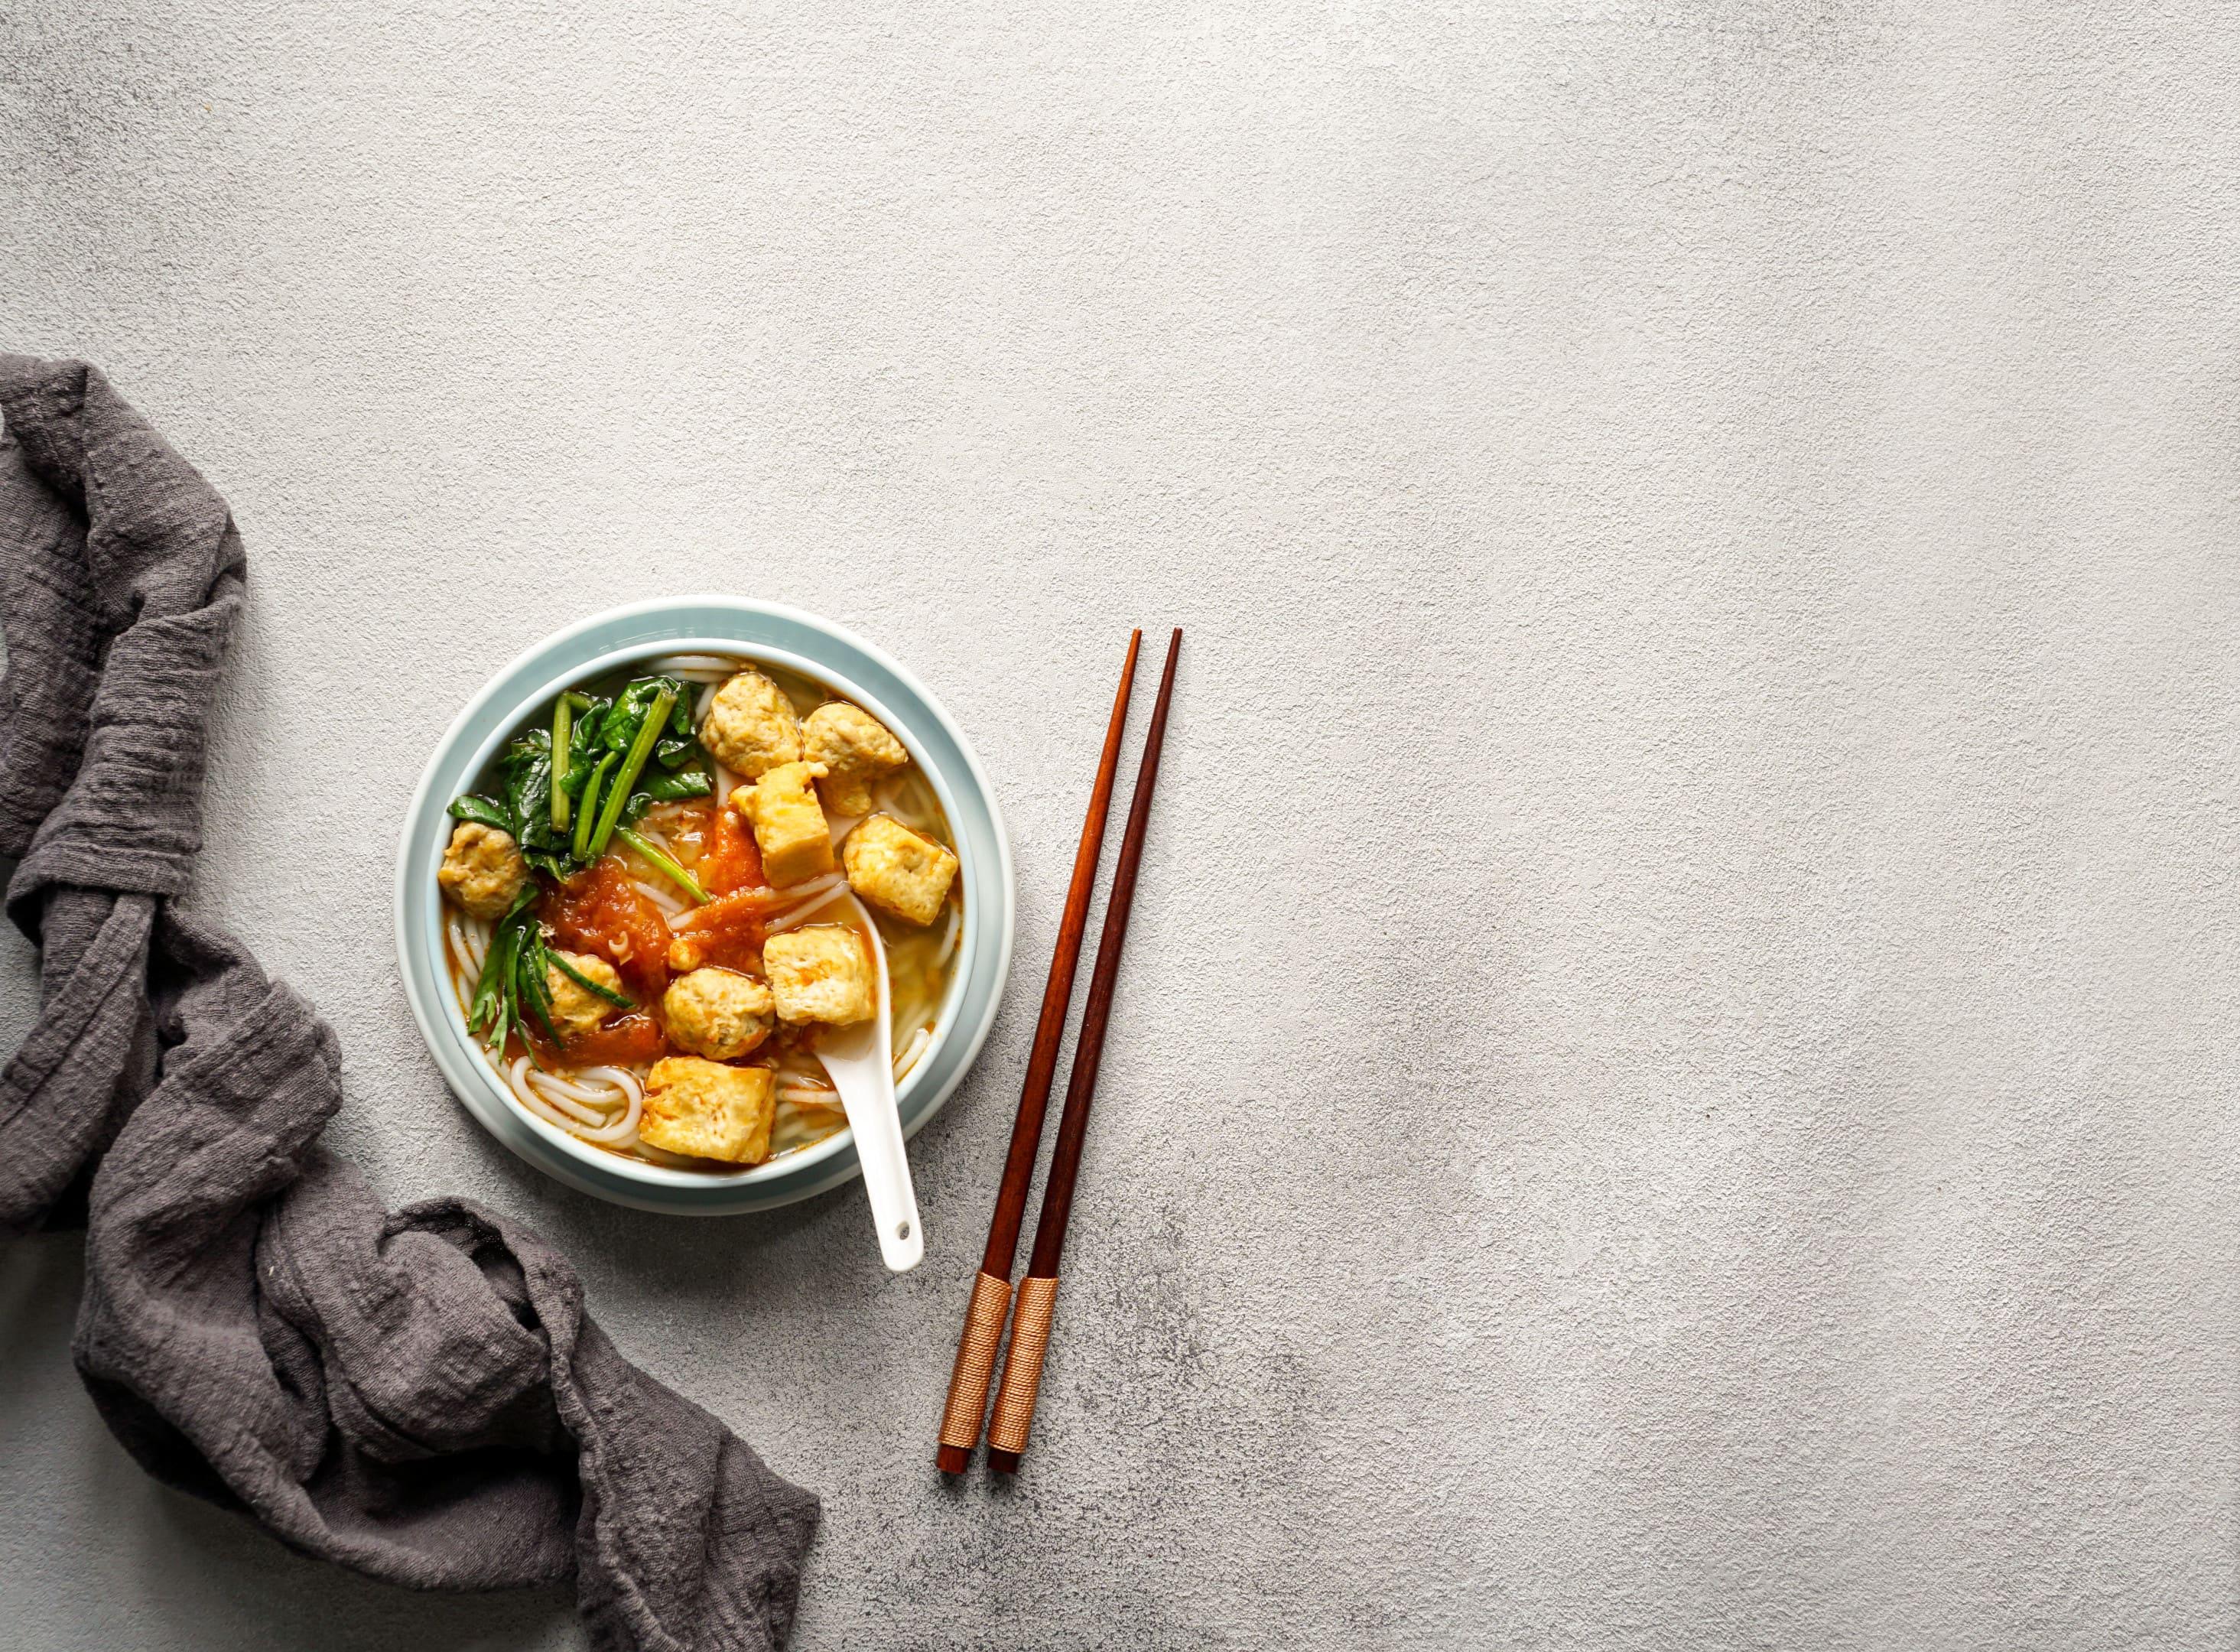 Vietnamese Noodle and Tofu soup